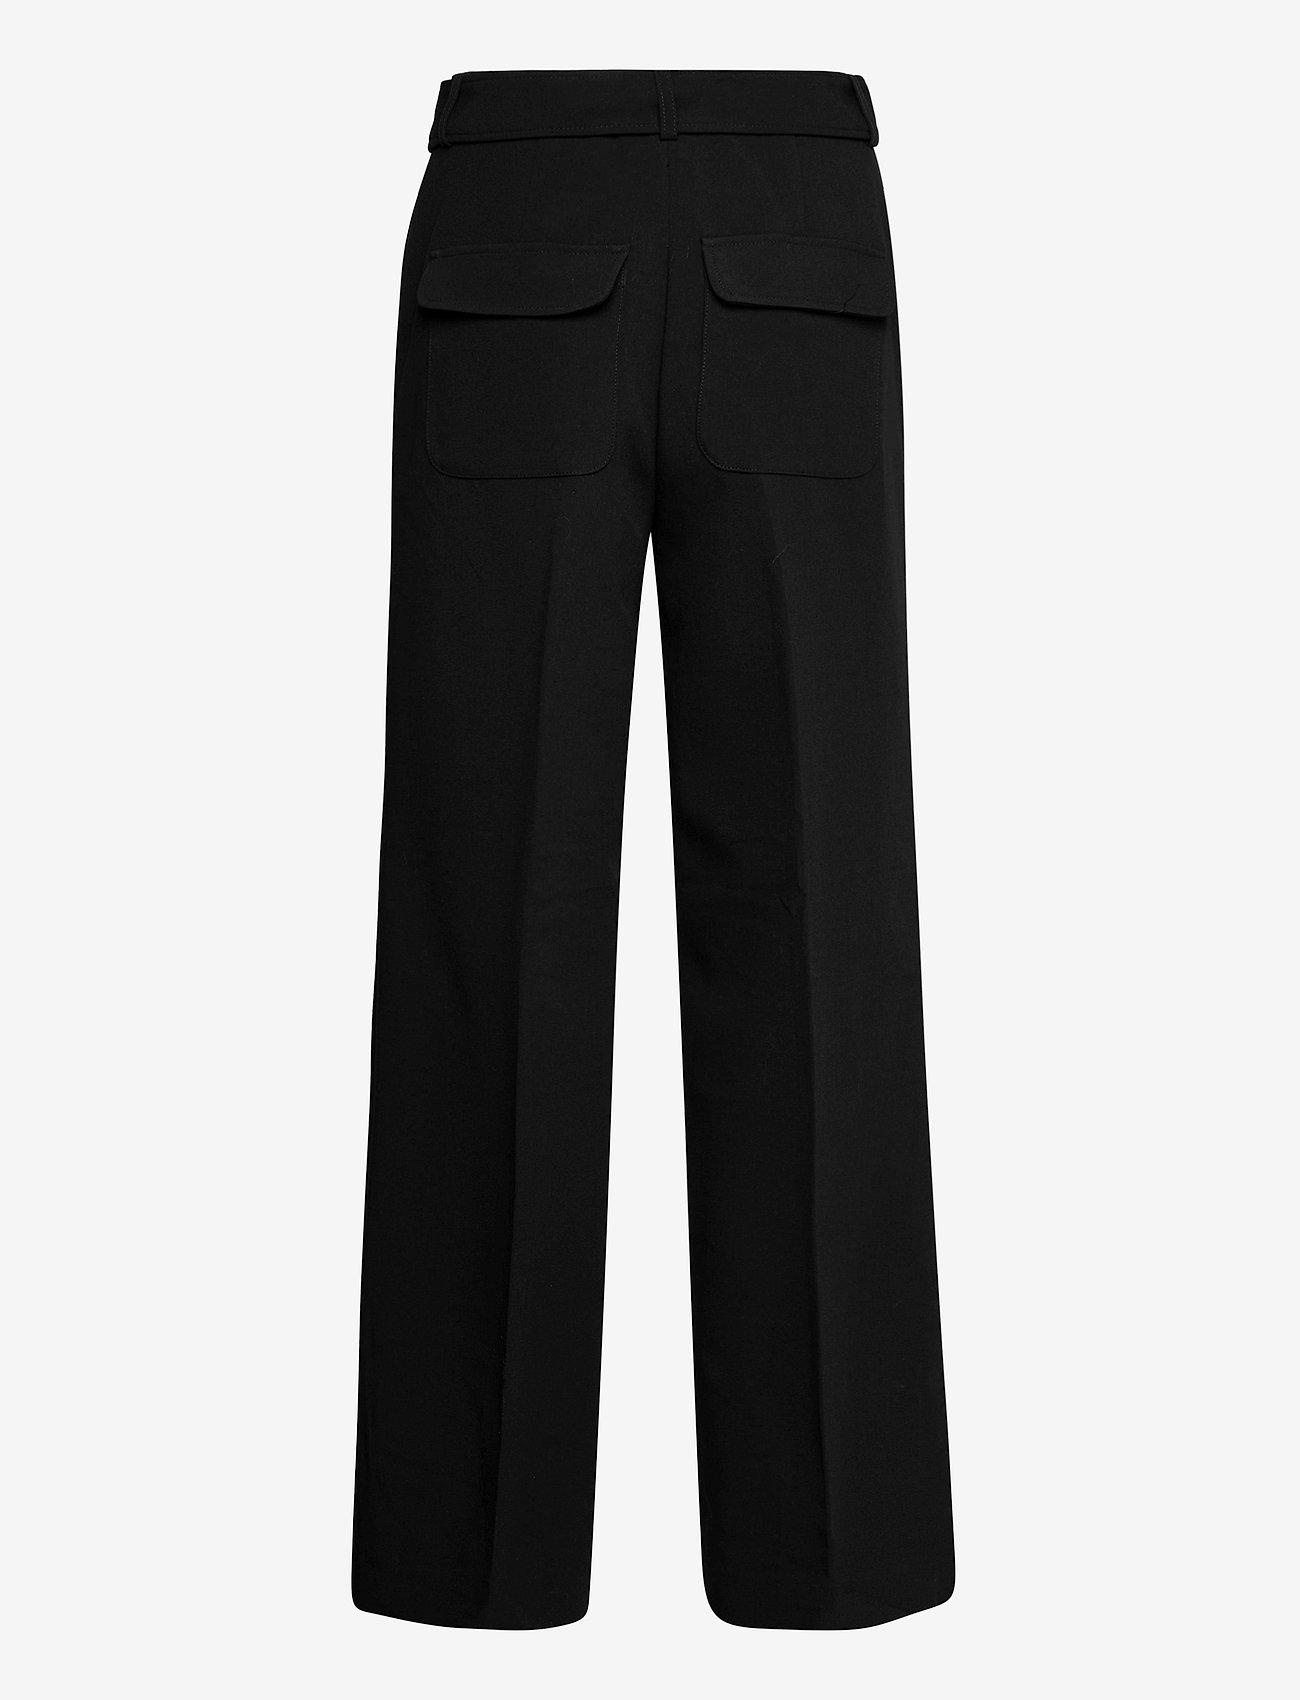 2NDDAY - 2ND Leonardo - straight leg trousers - black - 1